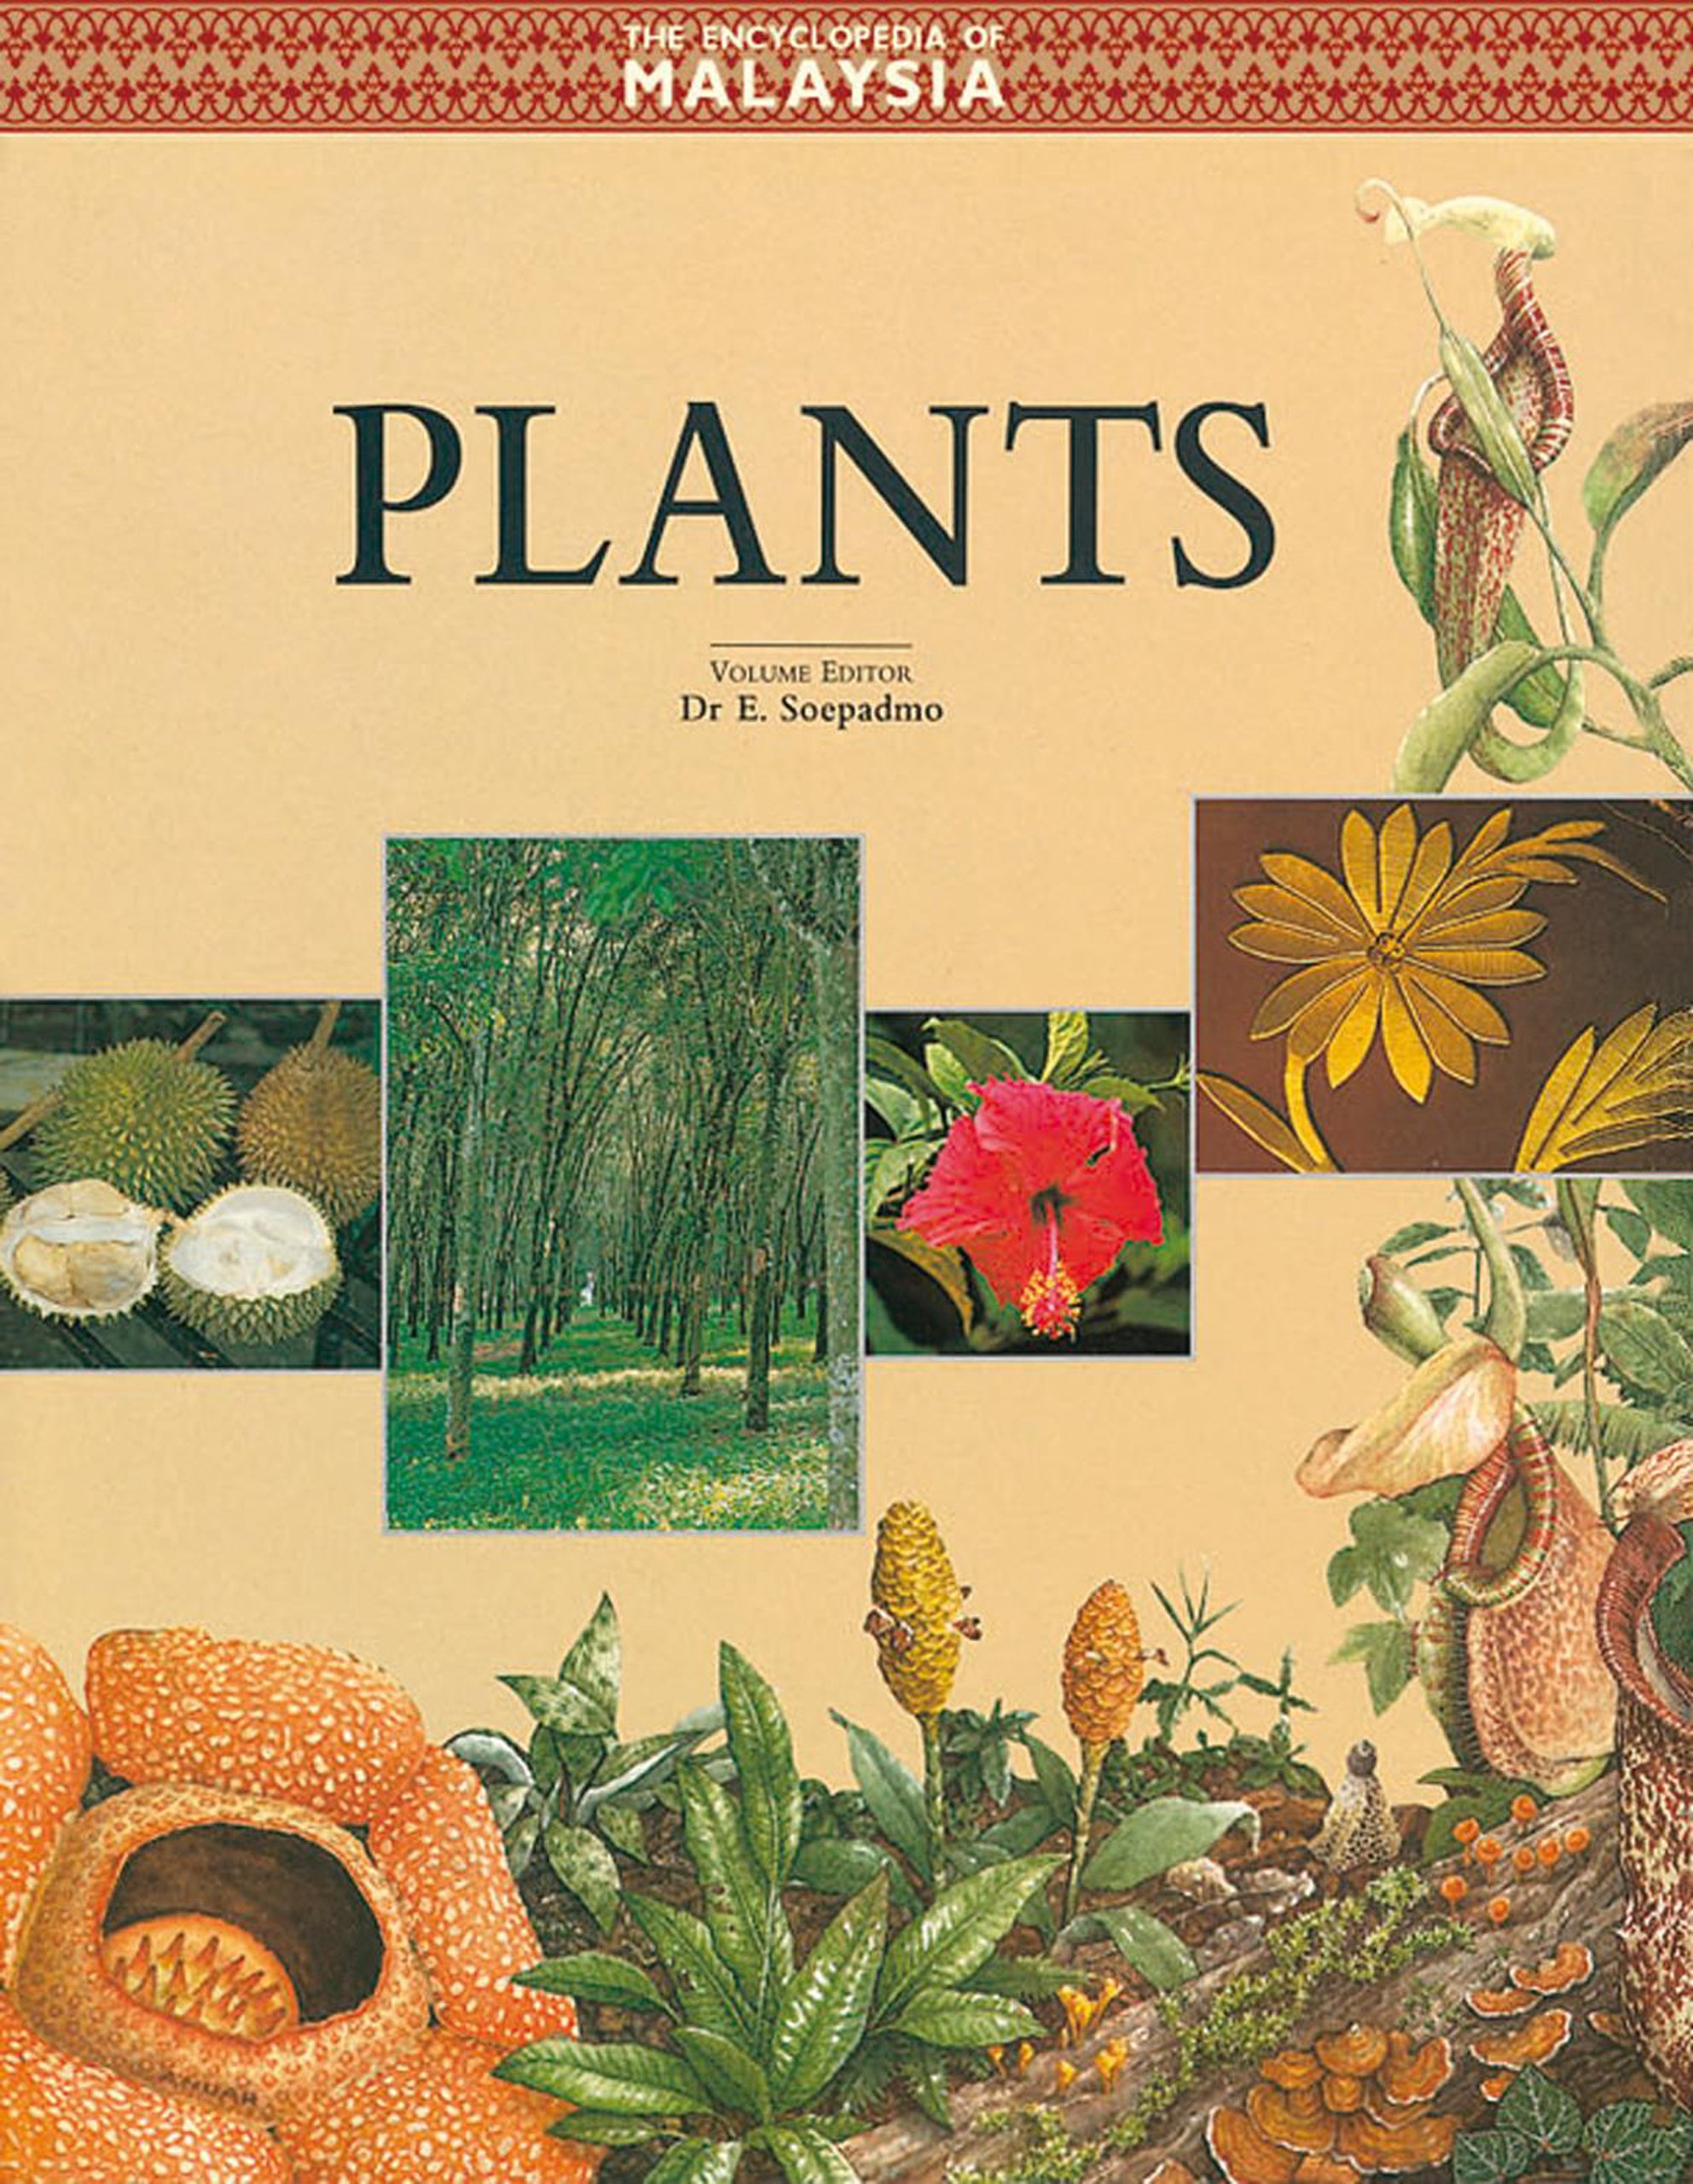 Encyclopedia of Malaysia V02: Plants (Encyclopedia of Malaysia (Archipelago Press)) pdf epub